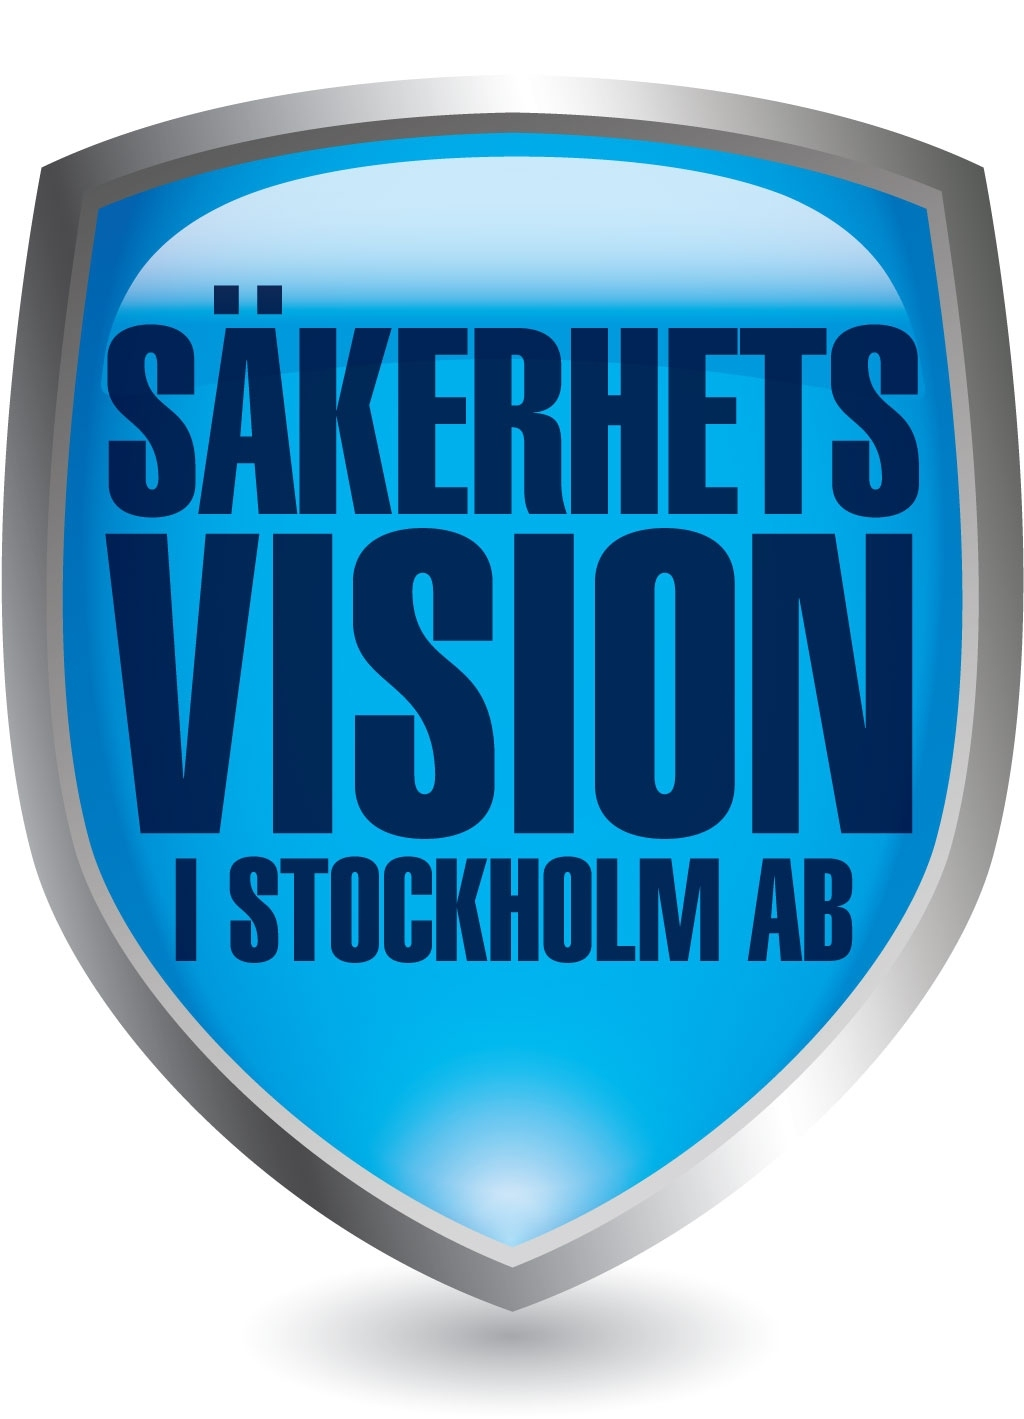 Säkerhetsvision i Stockholm AB